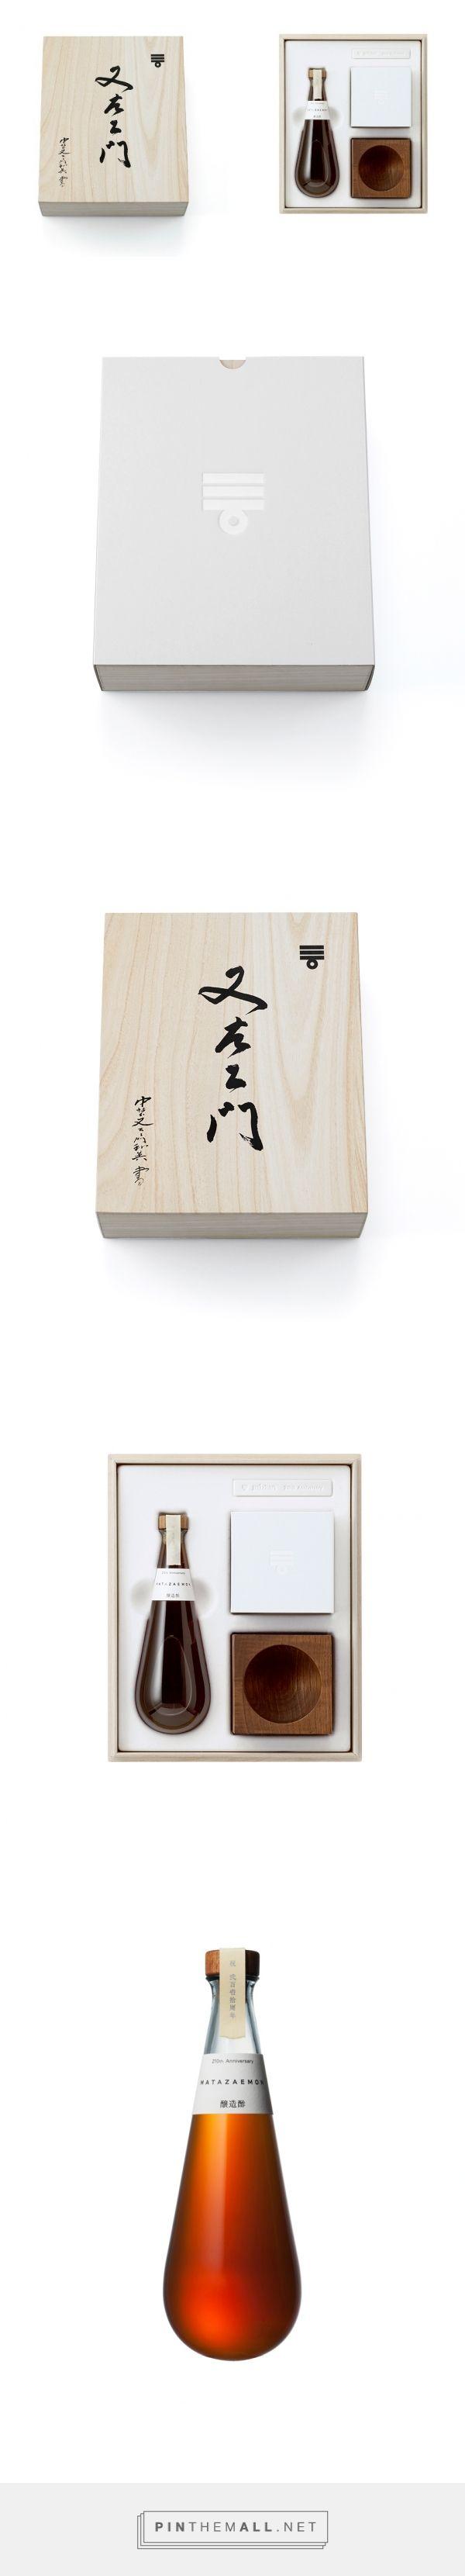 packaging / package design | Mizkan Vinegar by Taku Satoh | Spoon & Tamago